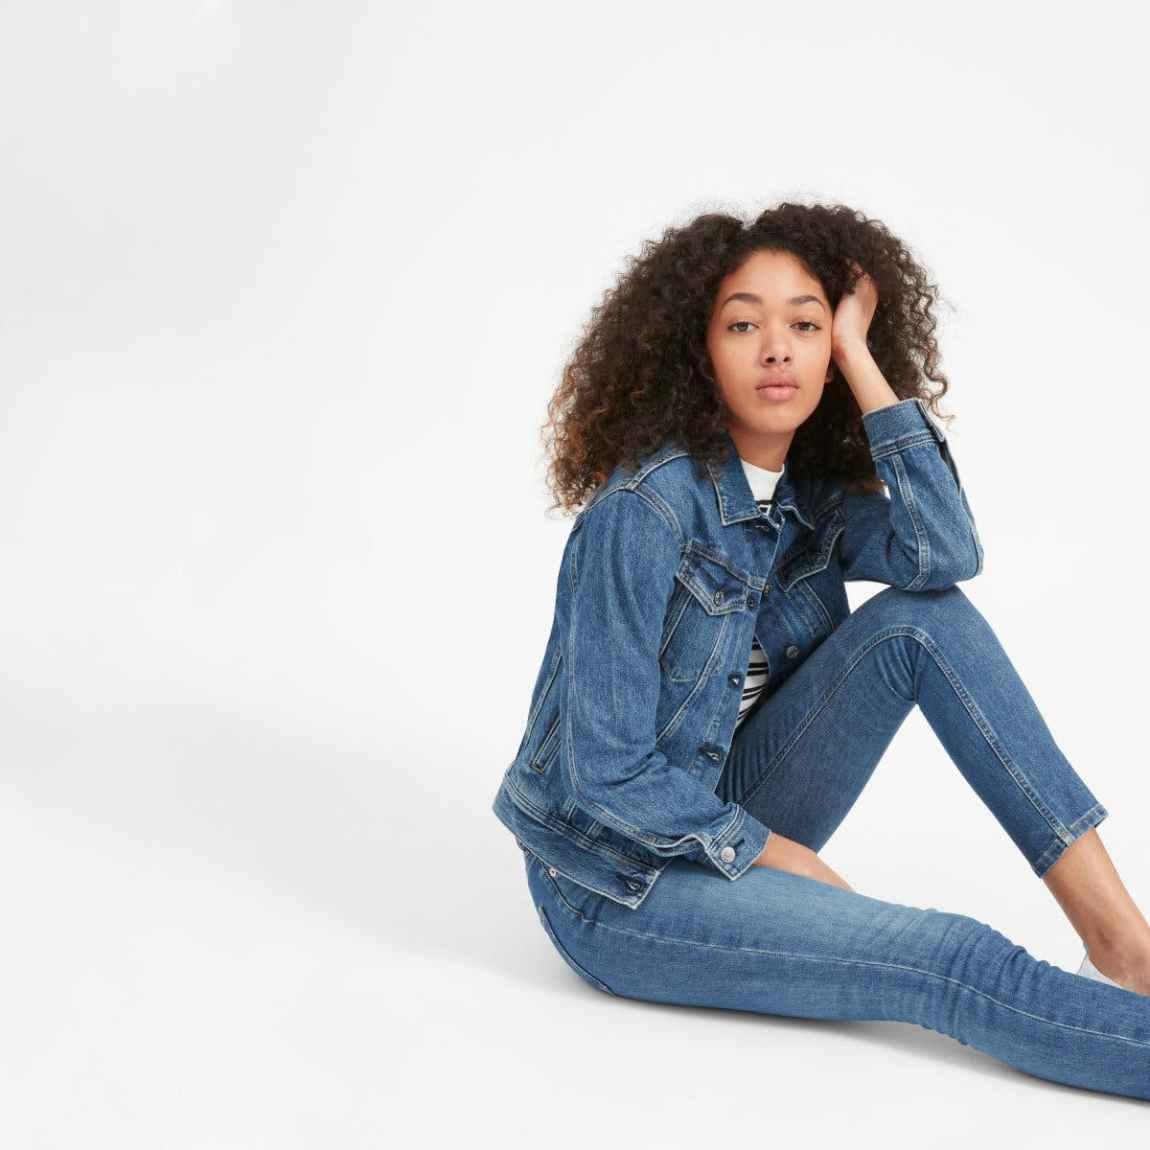 everlane, everlane jeans, everlane denim, denim jacket, washed blue, jean jacket, sustainable denim, japanese denim, denimblog, denim blog